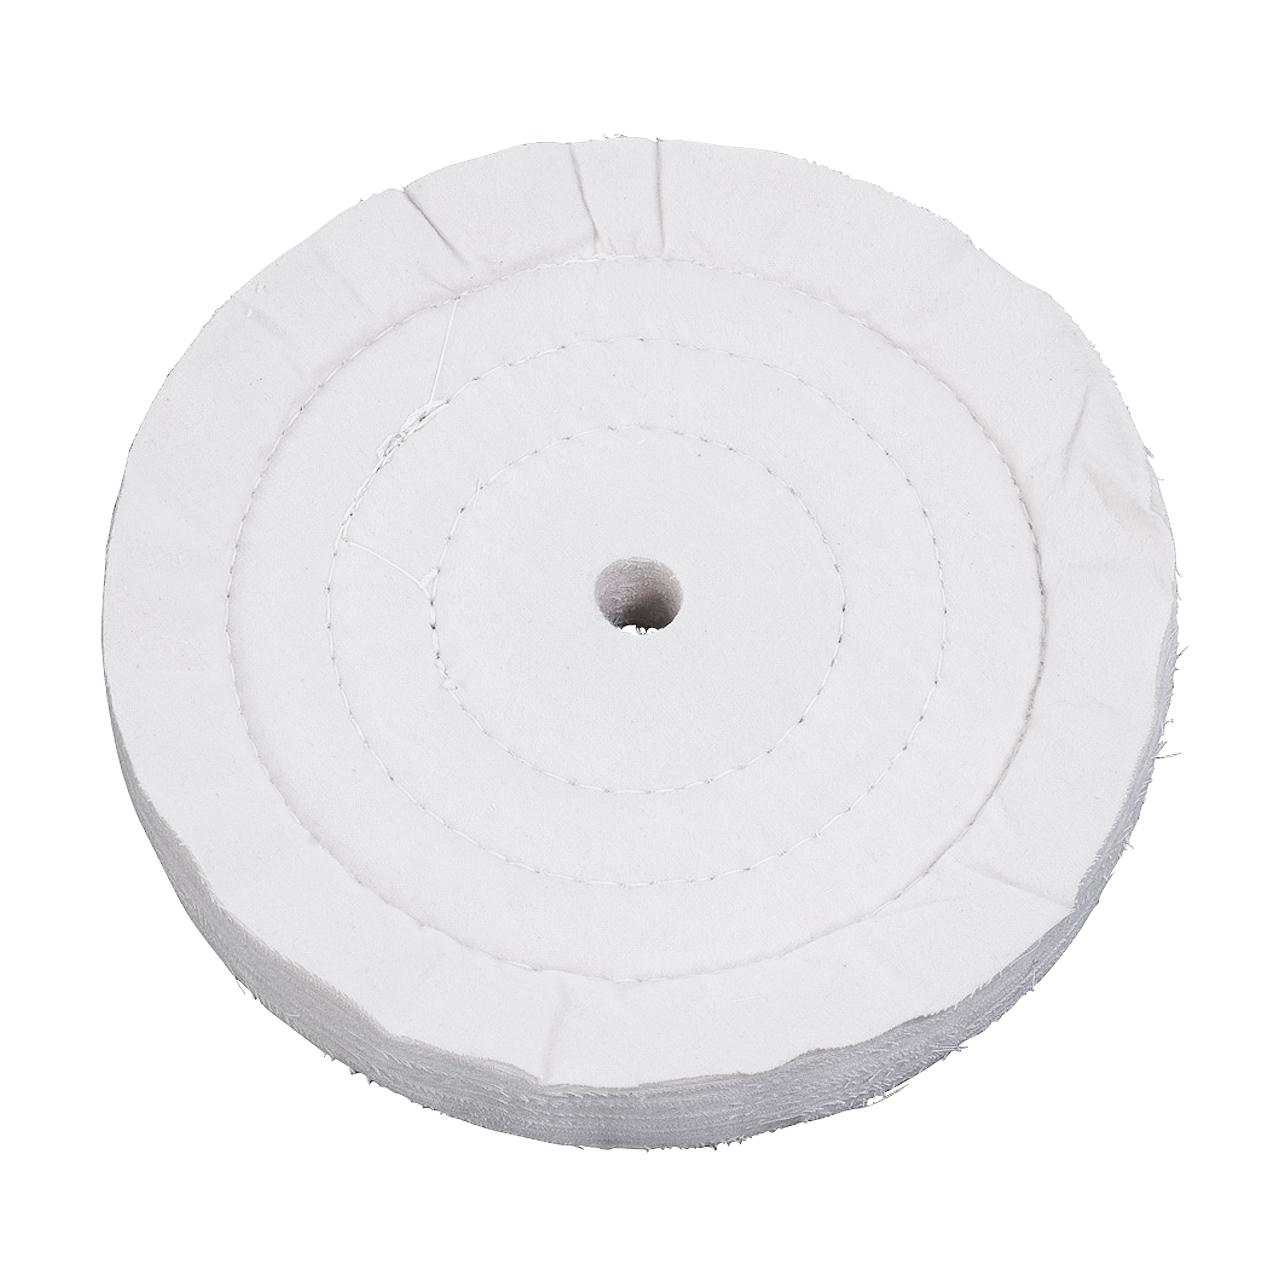 Tarcza polerska z moltonu pikowana Ø 200 x 20 mm, Ø 16 mm BERNARDO